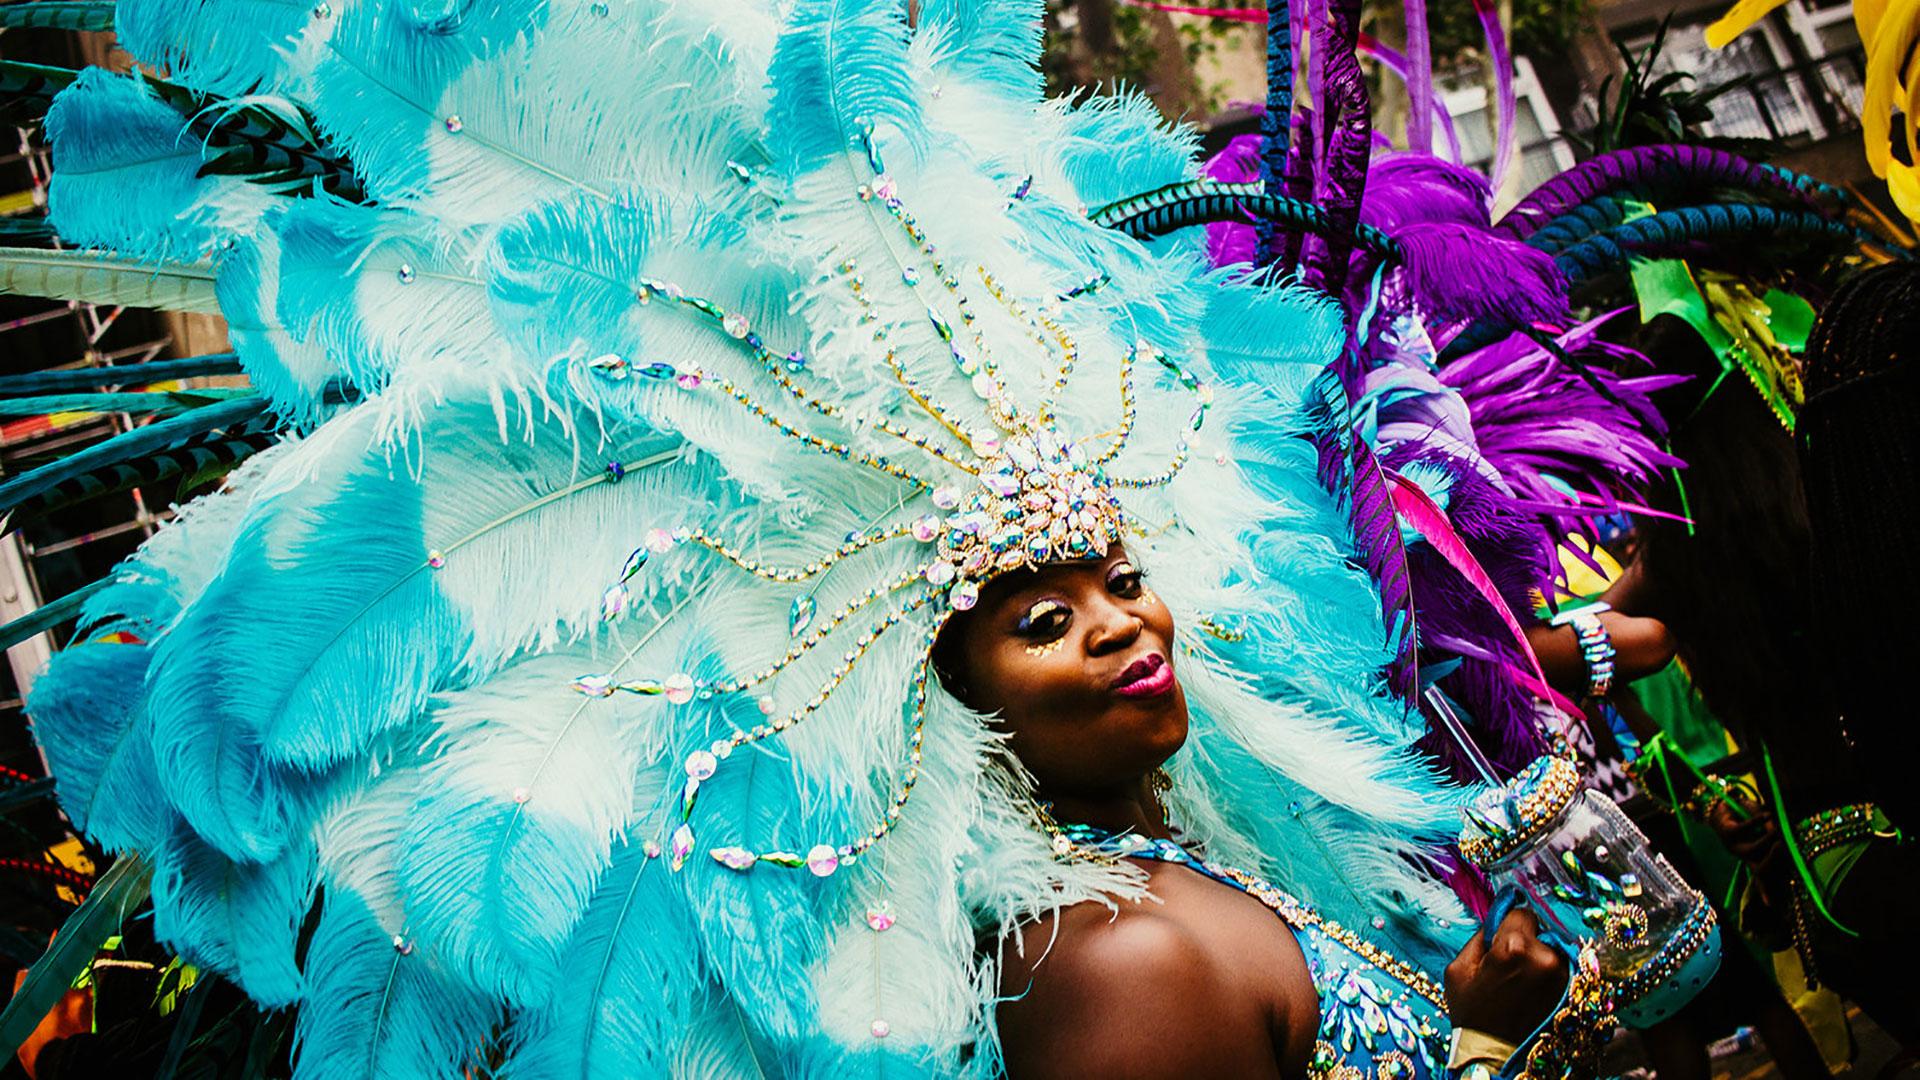 Notting Hill Carnival (Foto: Niall Green / Notting Hill Carnival Ltd.)